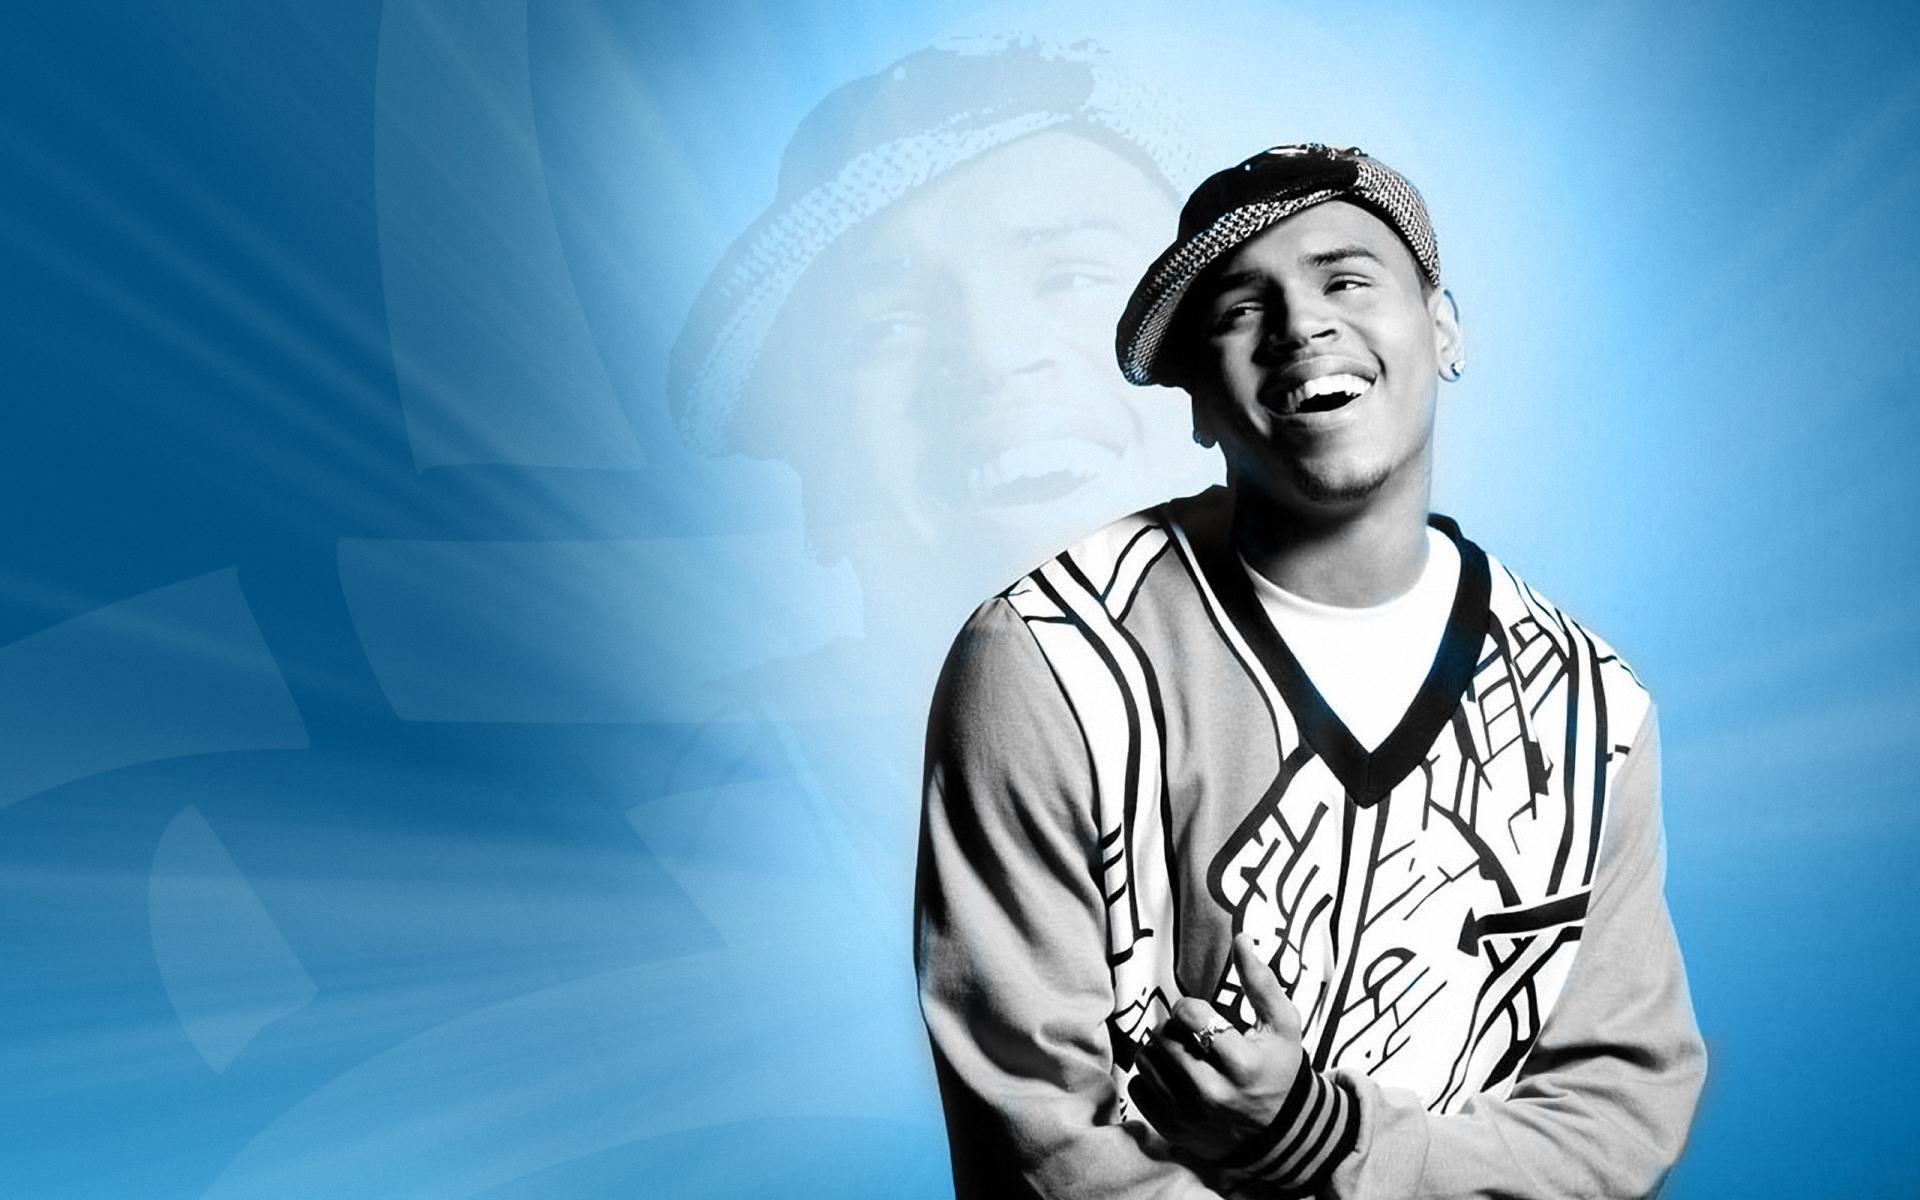 Chris Brown Album HD Desktop Wallpaper HD Desktop Wallpaper 1920x1200